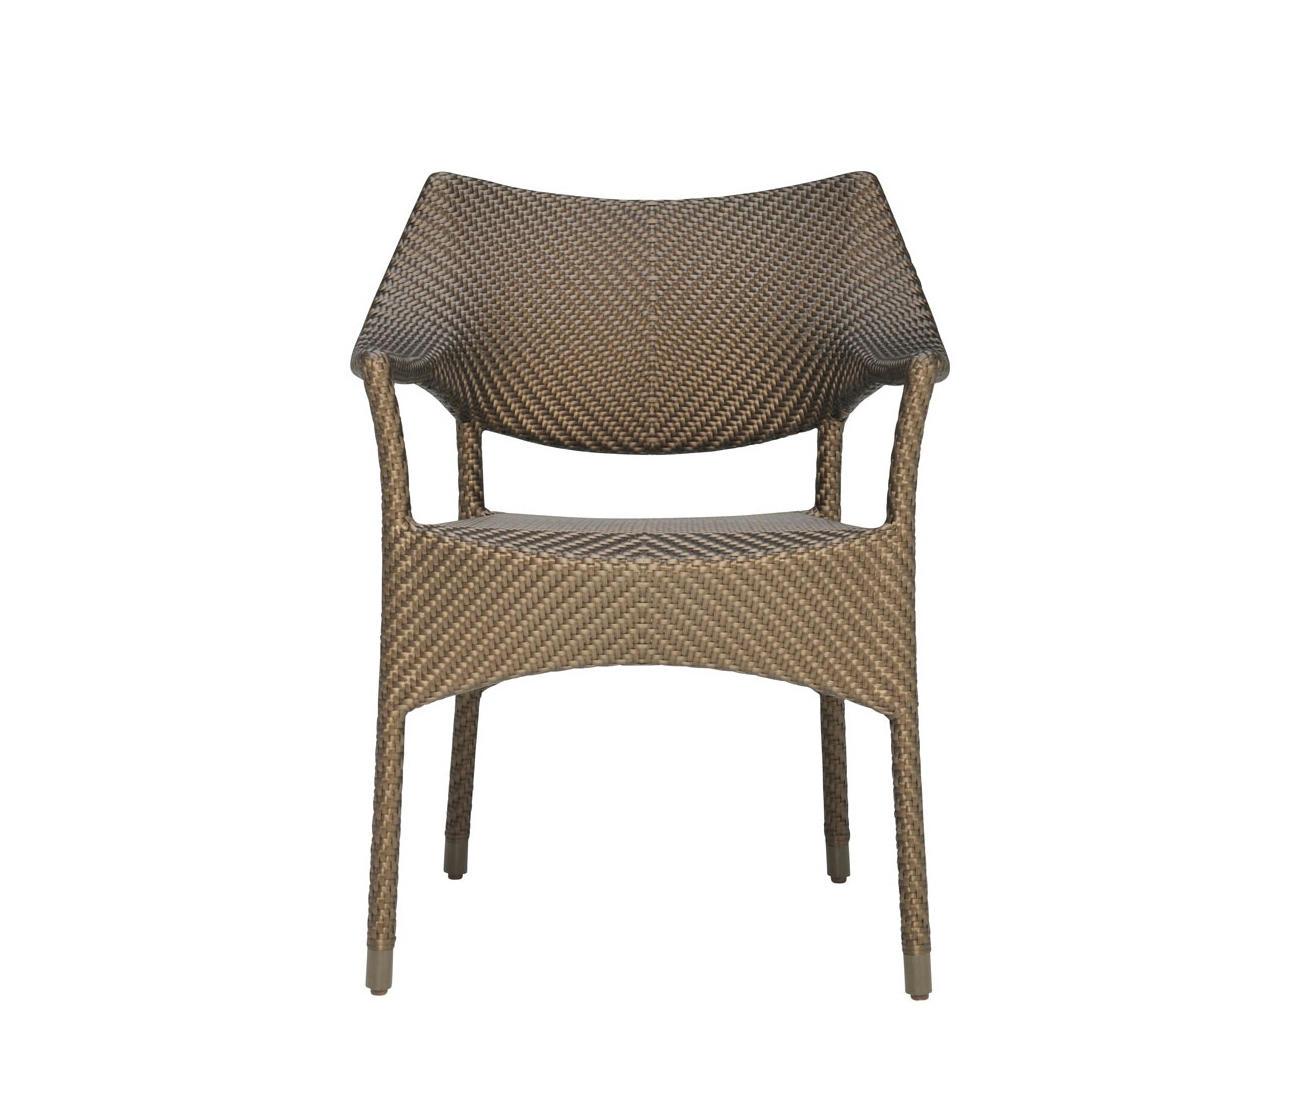 ... AMARI ARMCHAIR By JANUS Et Cie | Chairs ...